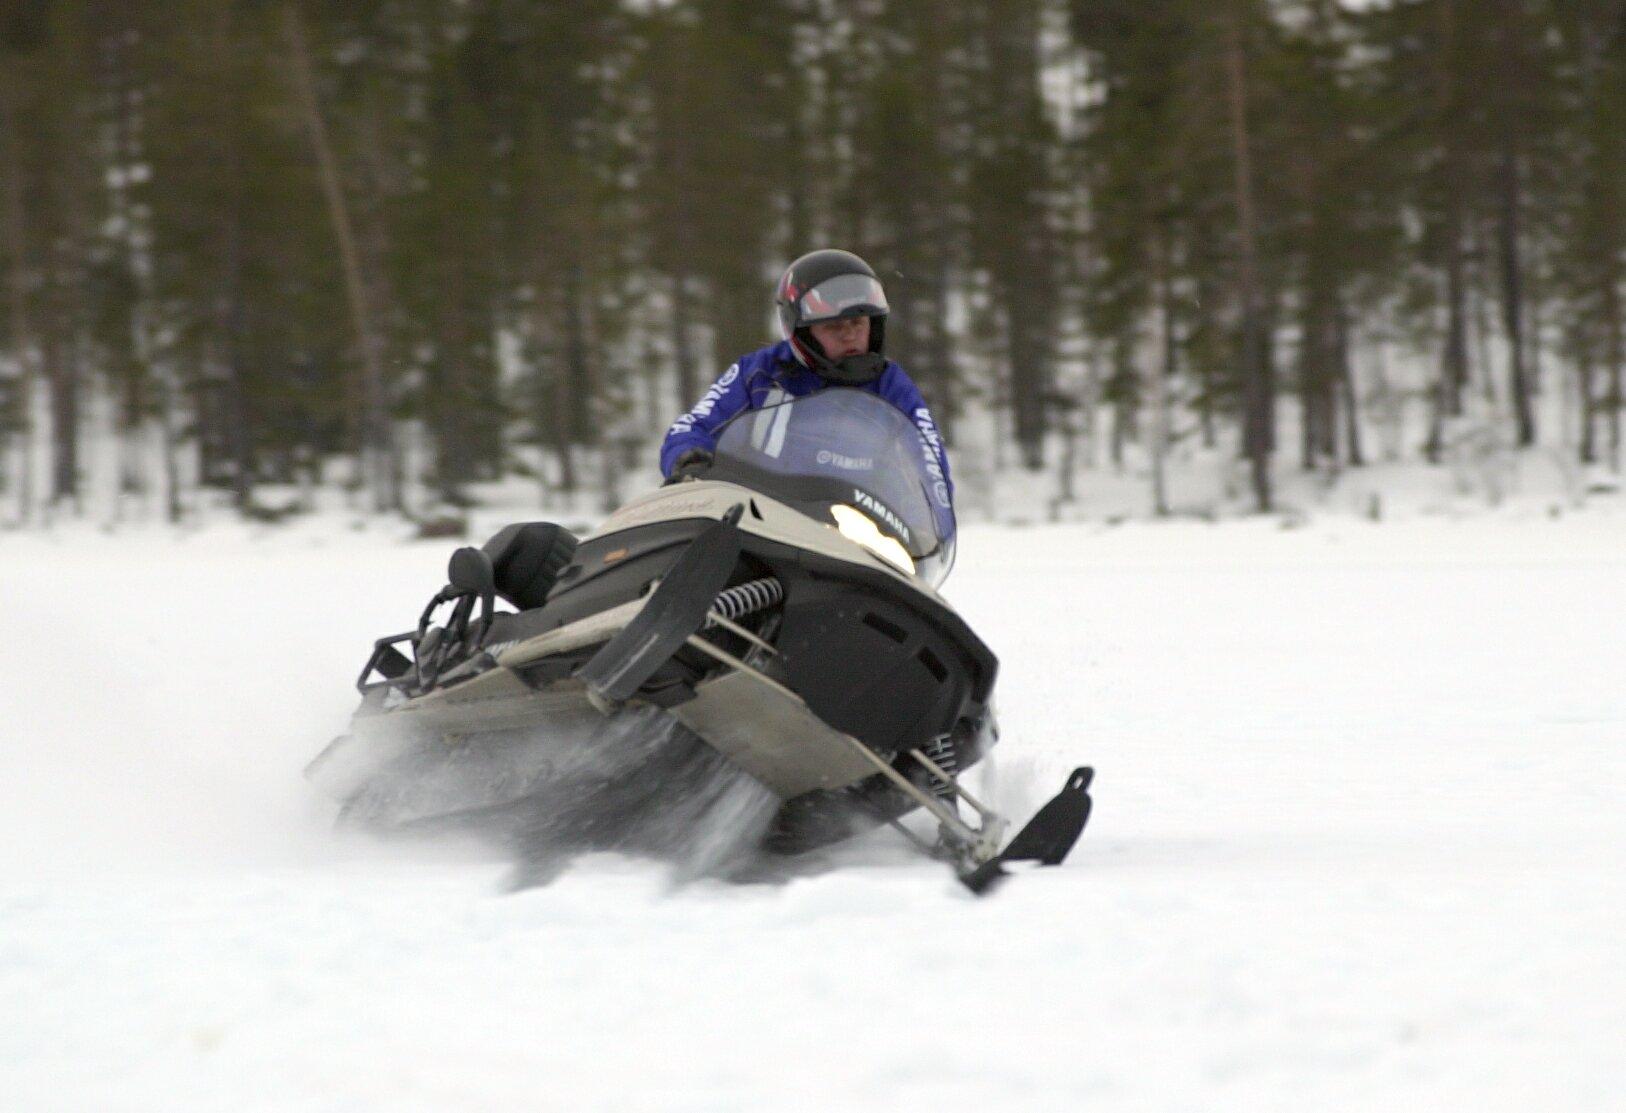 Snøscooter seljord